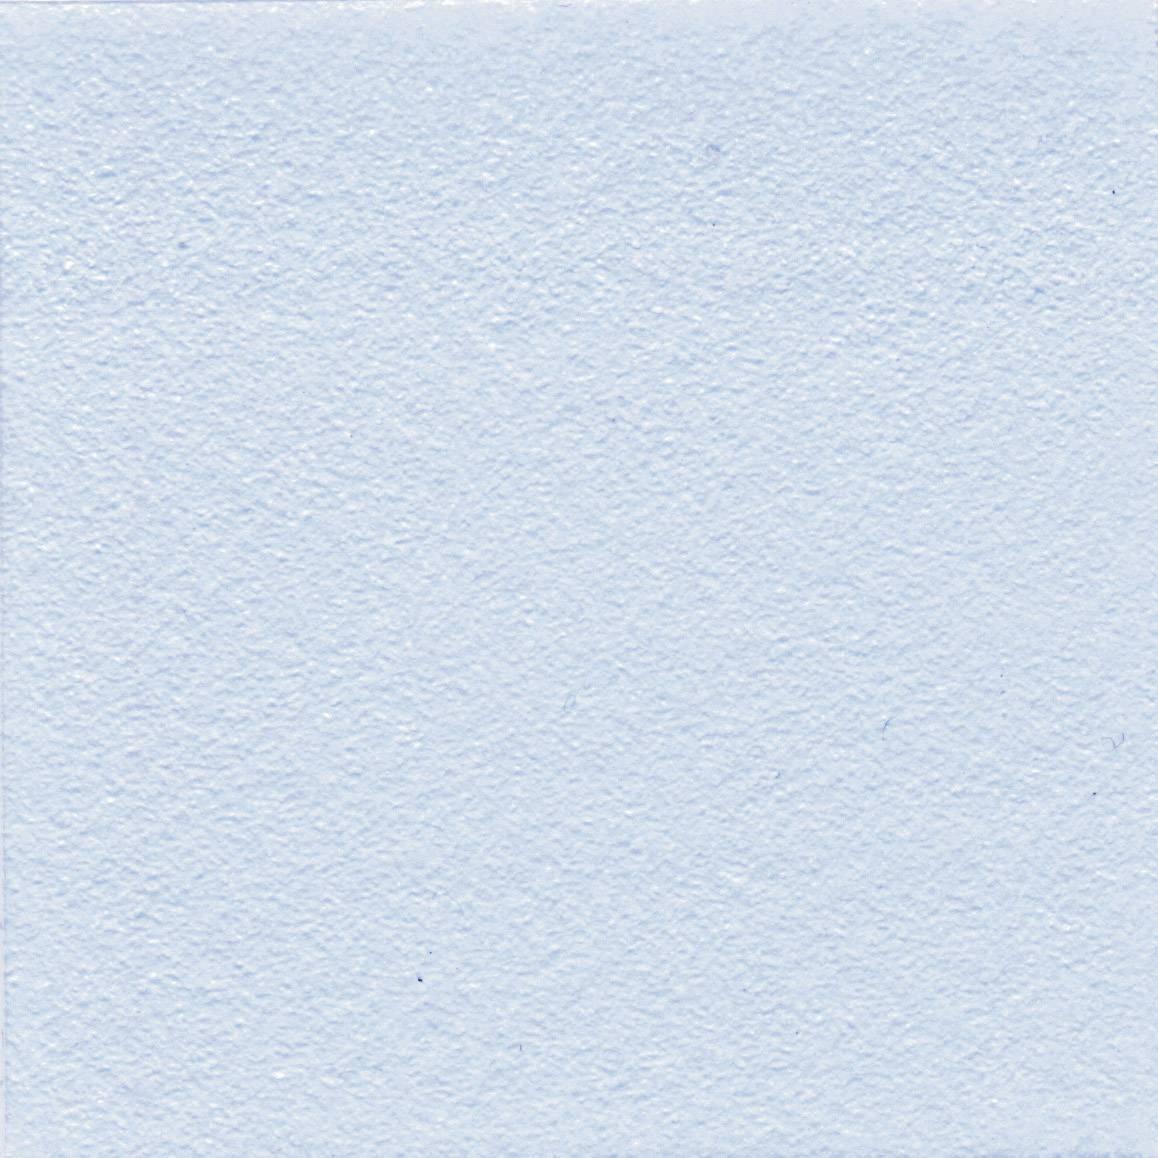 Teplovodivá fólia Kerafol SOFTTHERM 86/300, 5 mm, 3 W/mK, (d x š) 50 mm x 50 mm